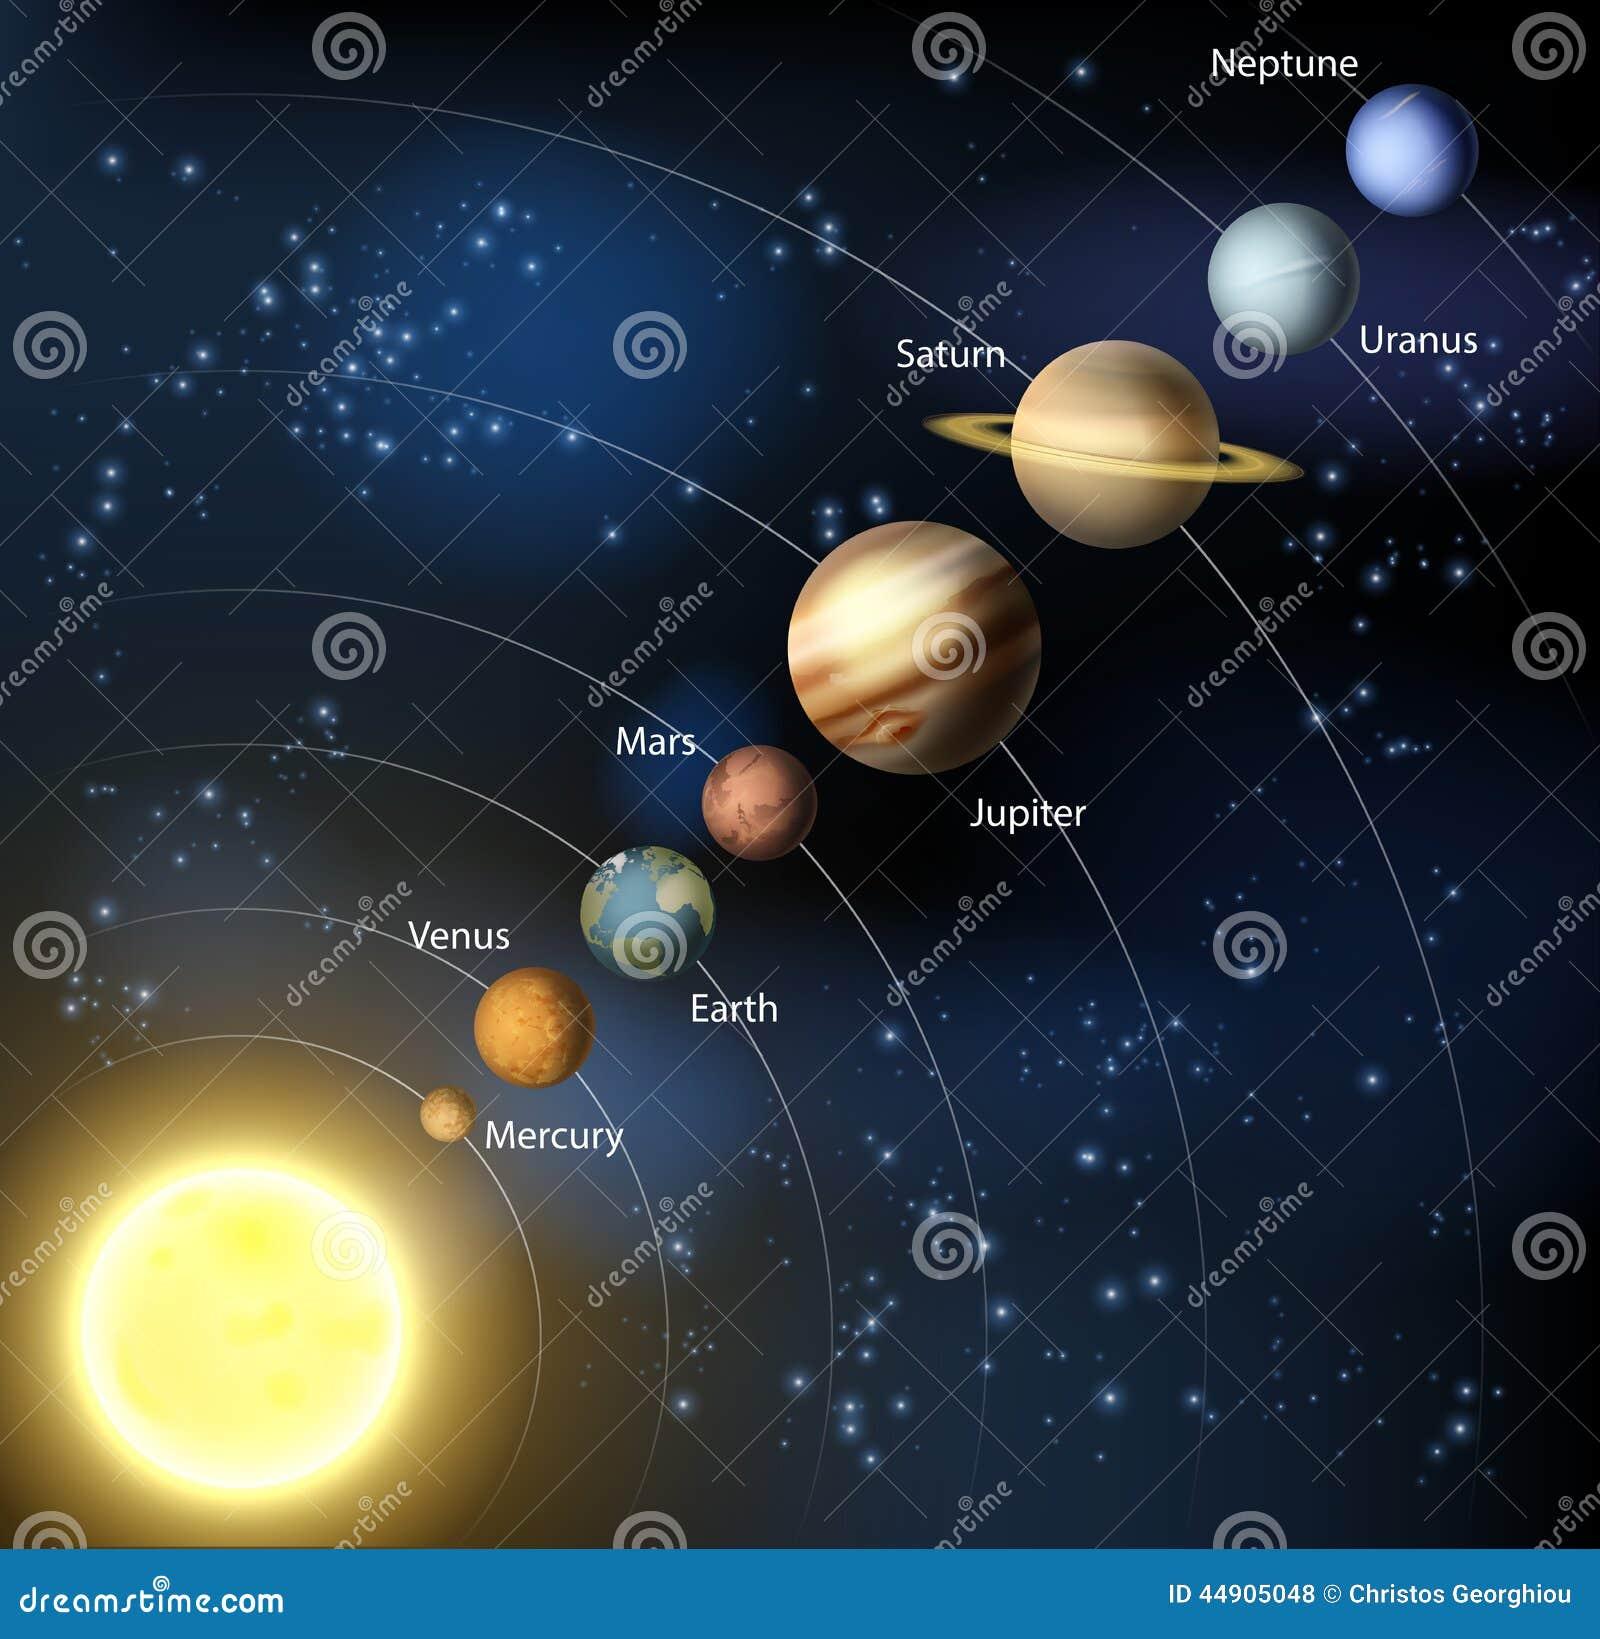 planets around the sun - photo #25